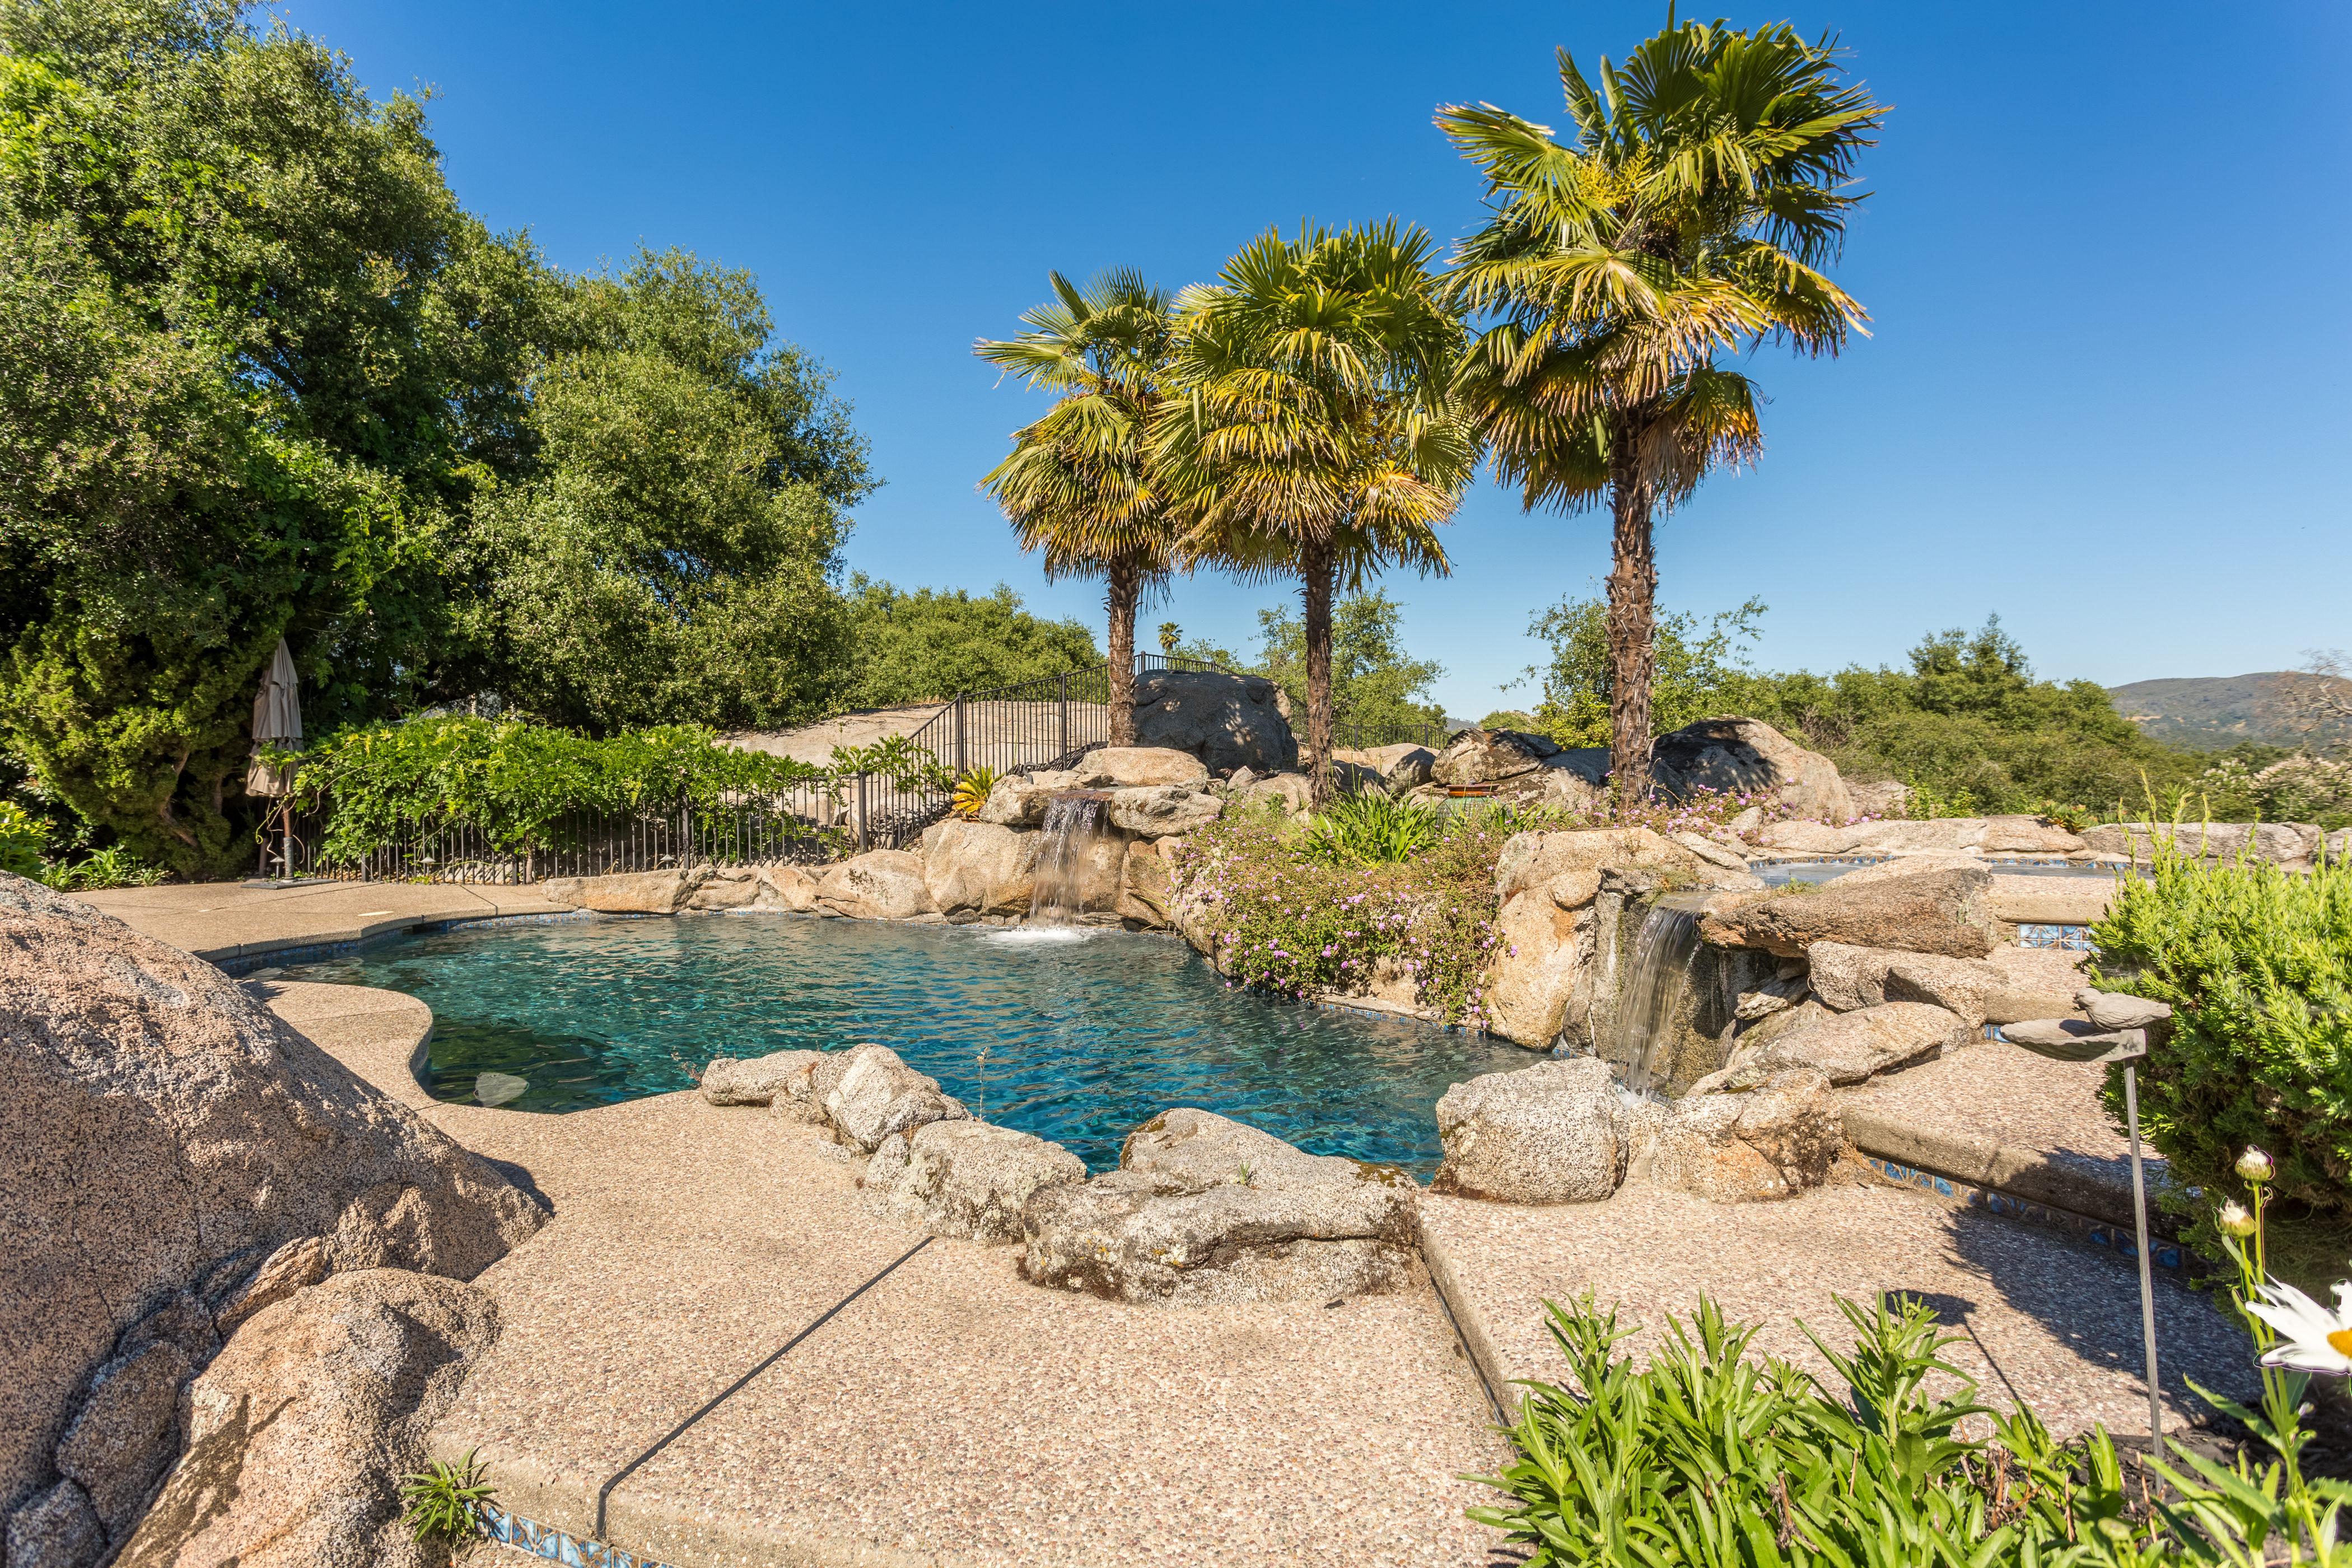 Backyard with pool and views of Folsom Lake - 8950 Vista De Lago